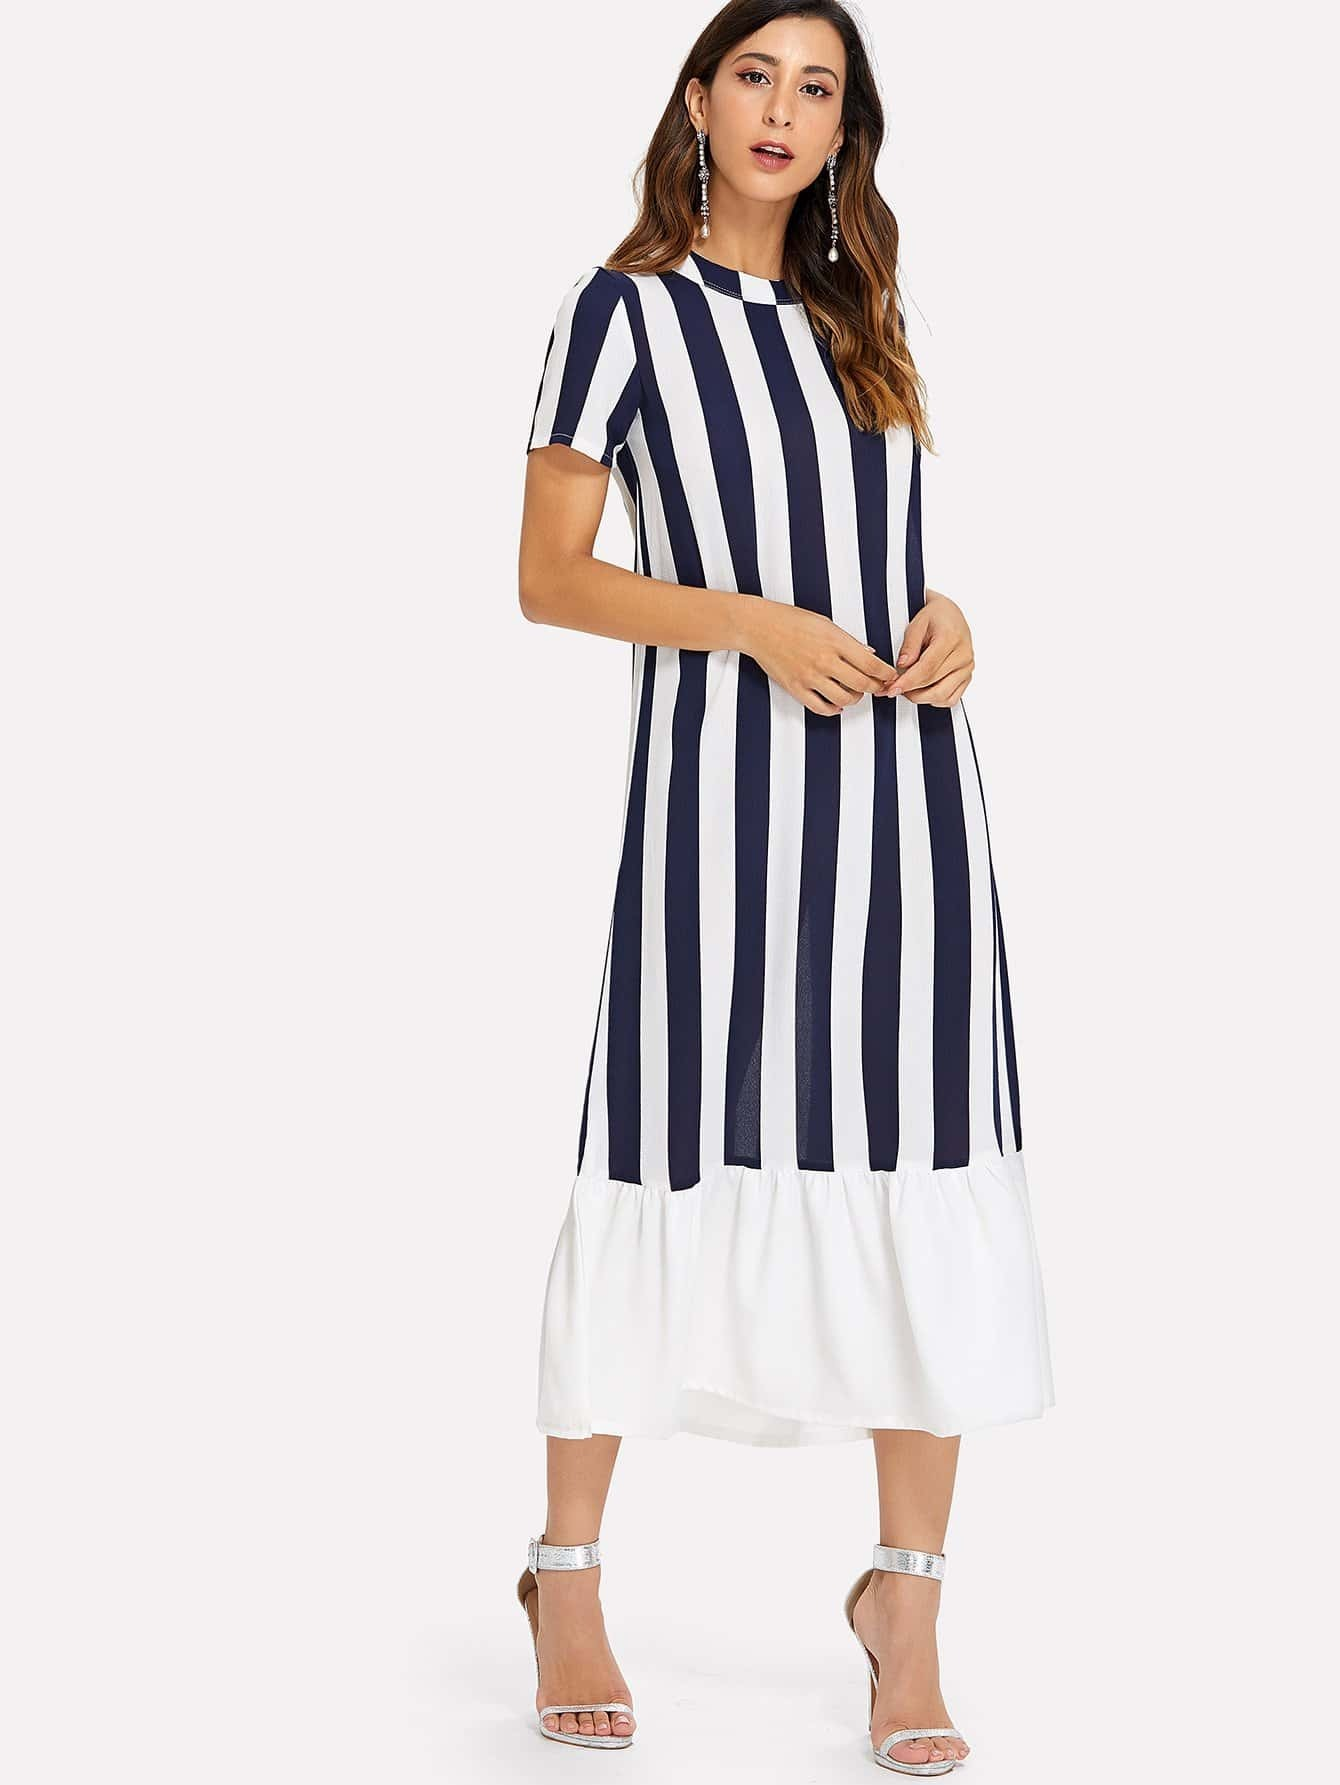 Contrast Striped Pep Hem Dress contrast striped button back pep hem blouse